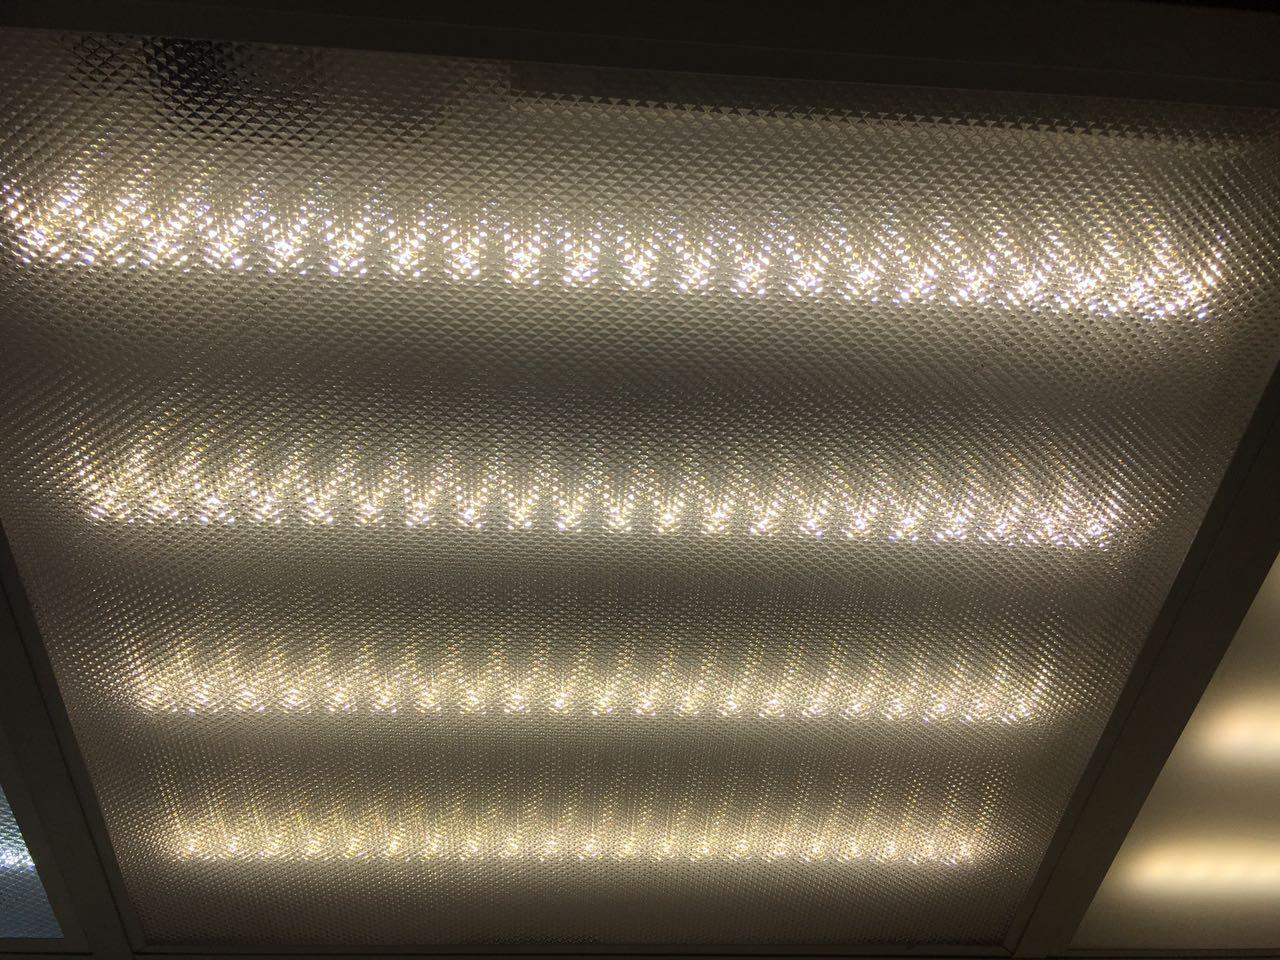 Светильник LED Avrora Prisma 32Вт 5000К 3600 Лм 588х588мм